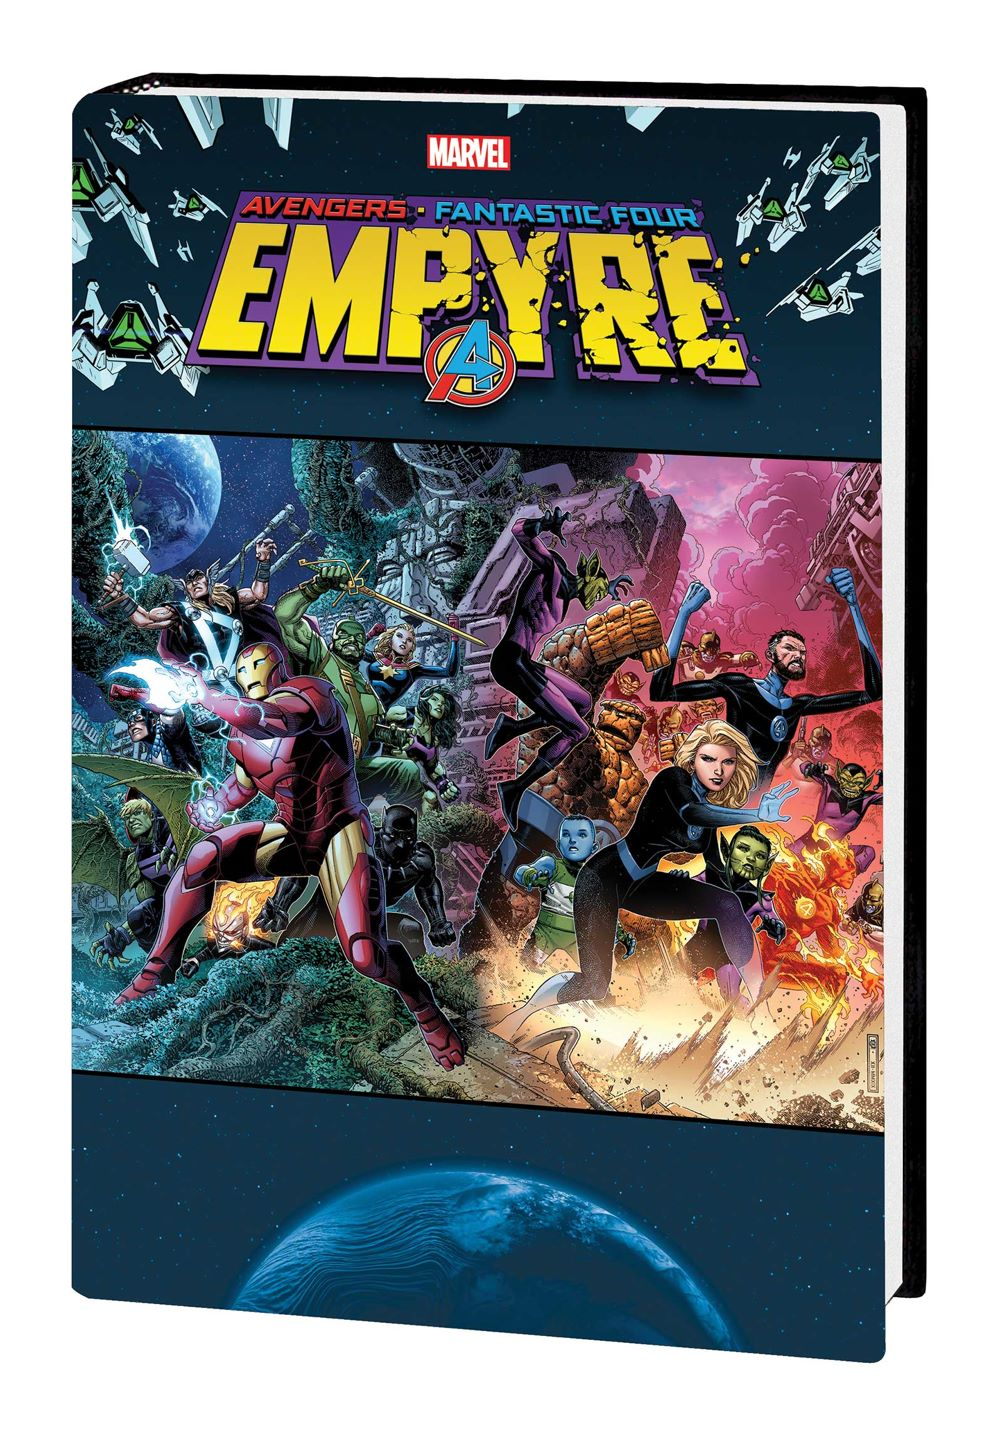 EMPYRE_OMNIBUS_HC Marvel Comics January 2021 Solicitations